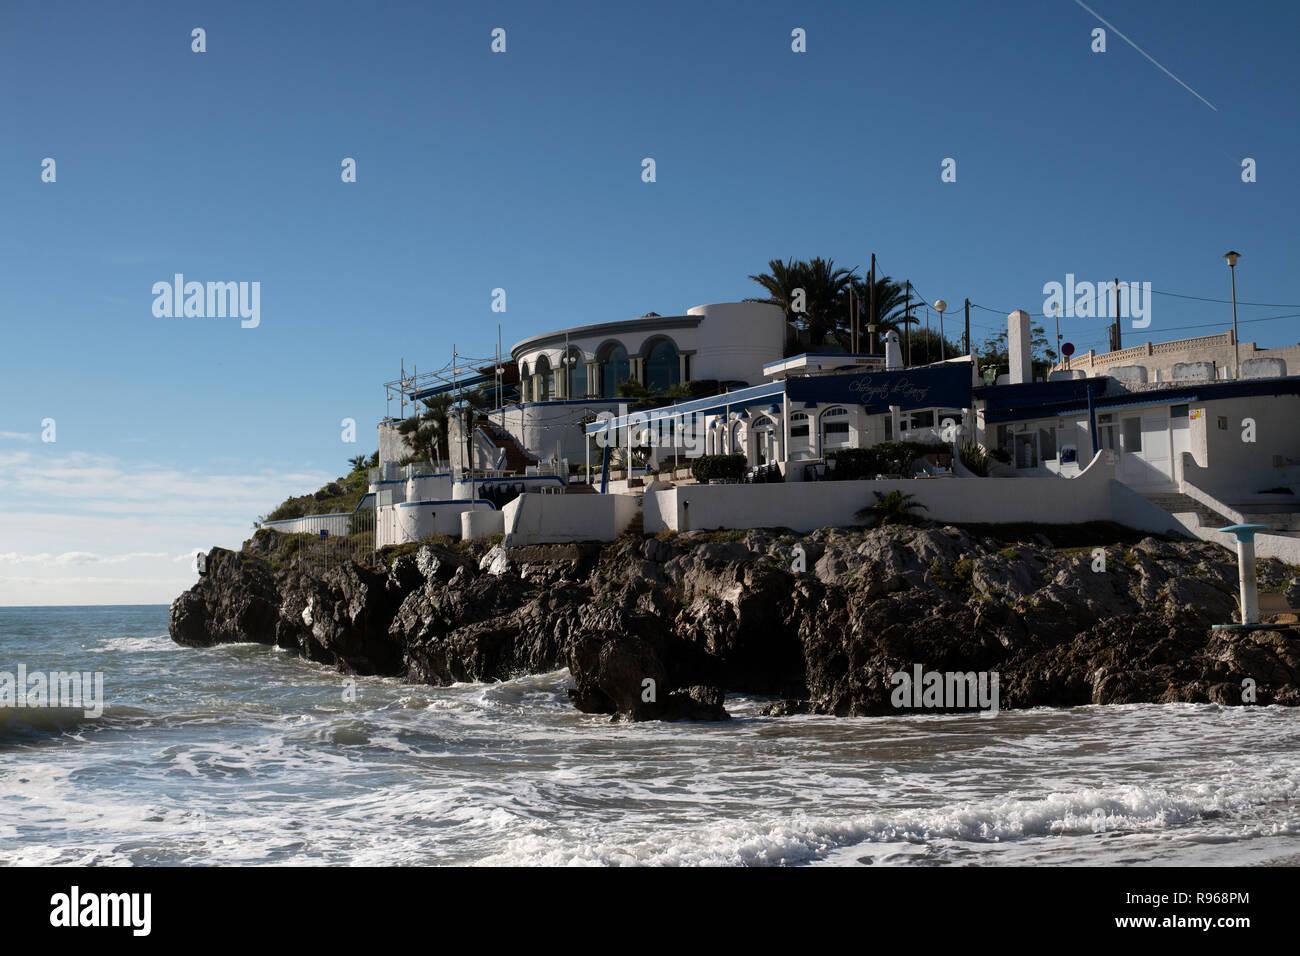 Buildings on rocky ledge overlooking the Mediterranean in Garaff Spain - Stock Image